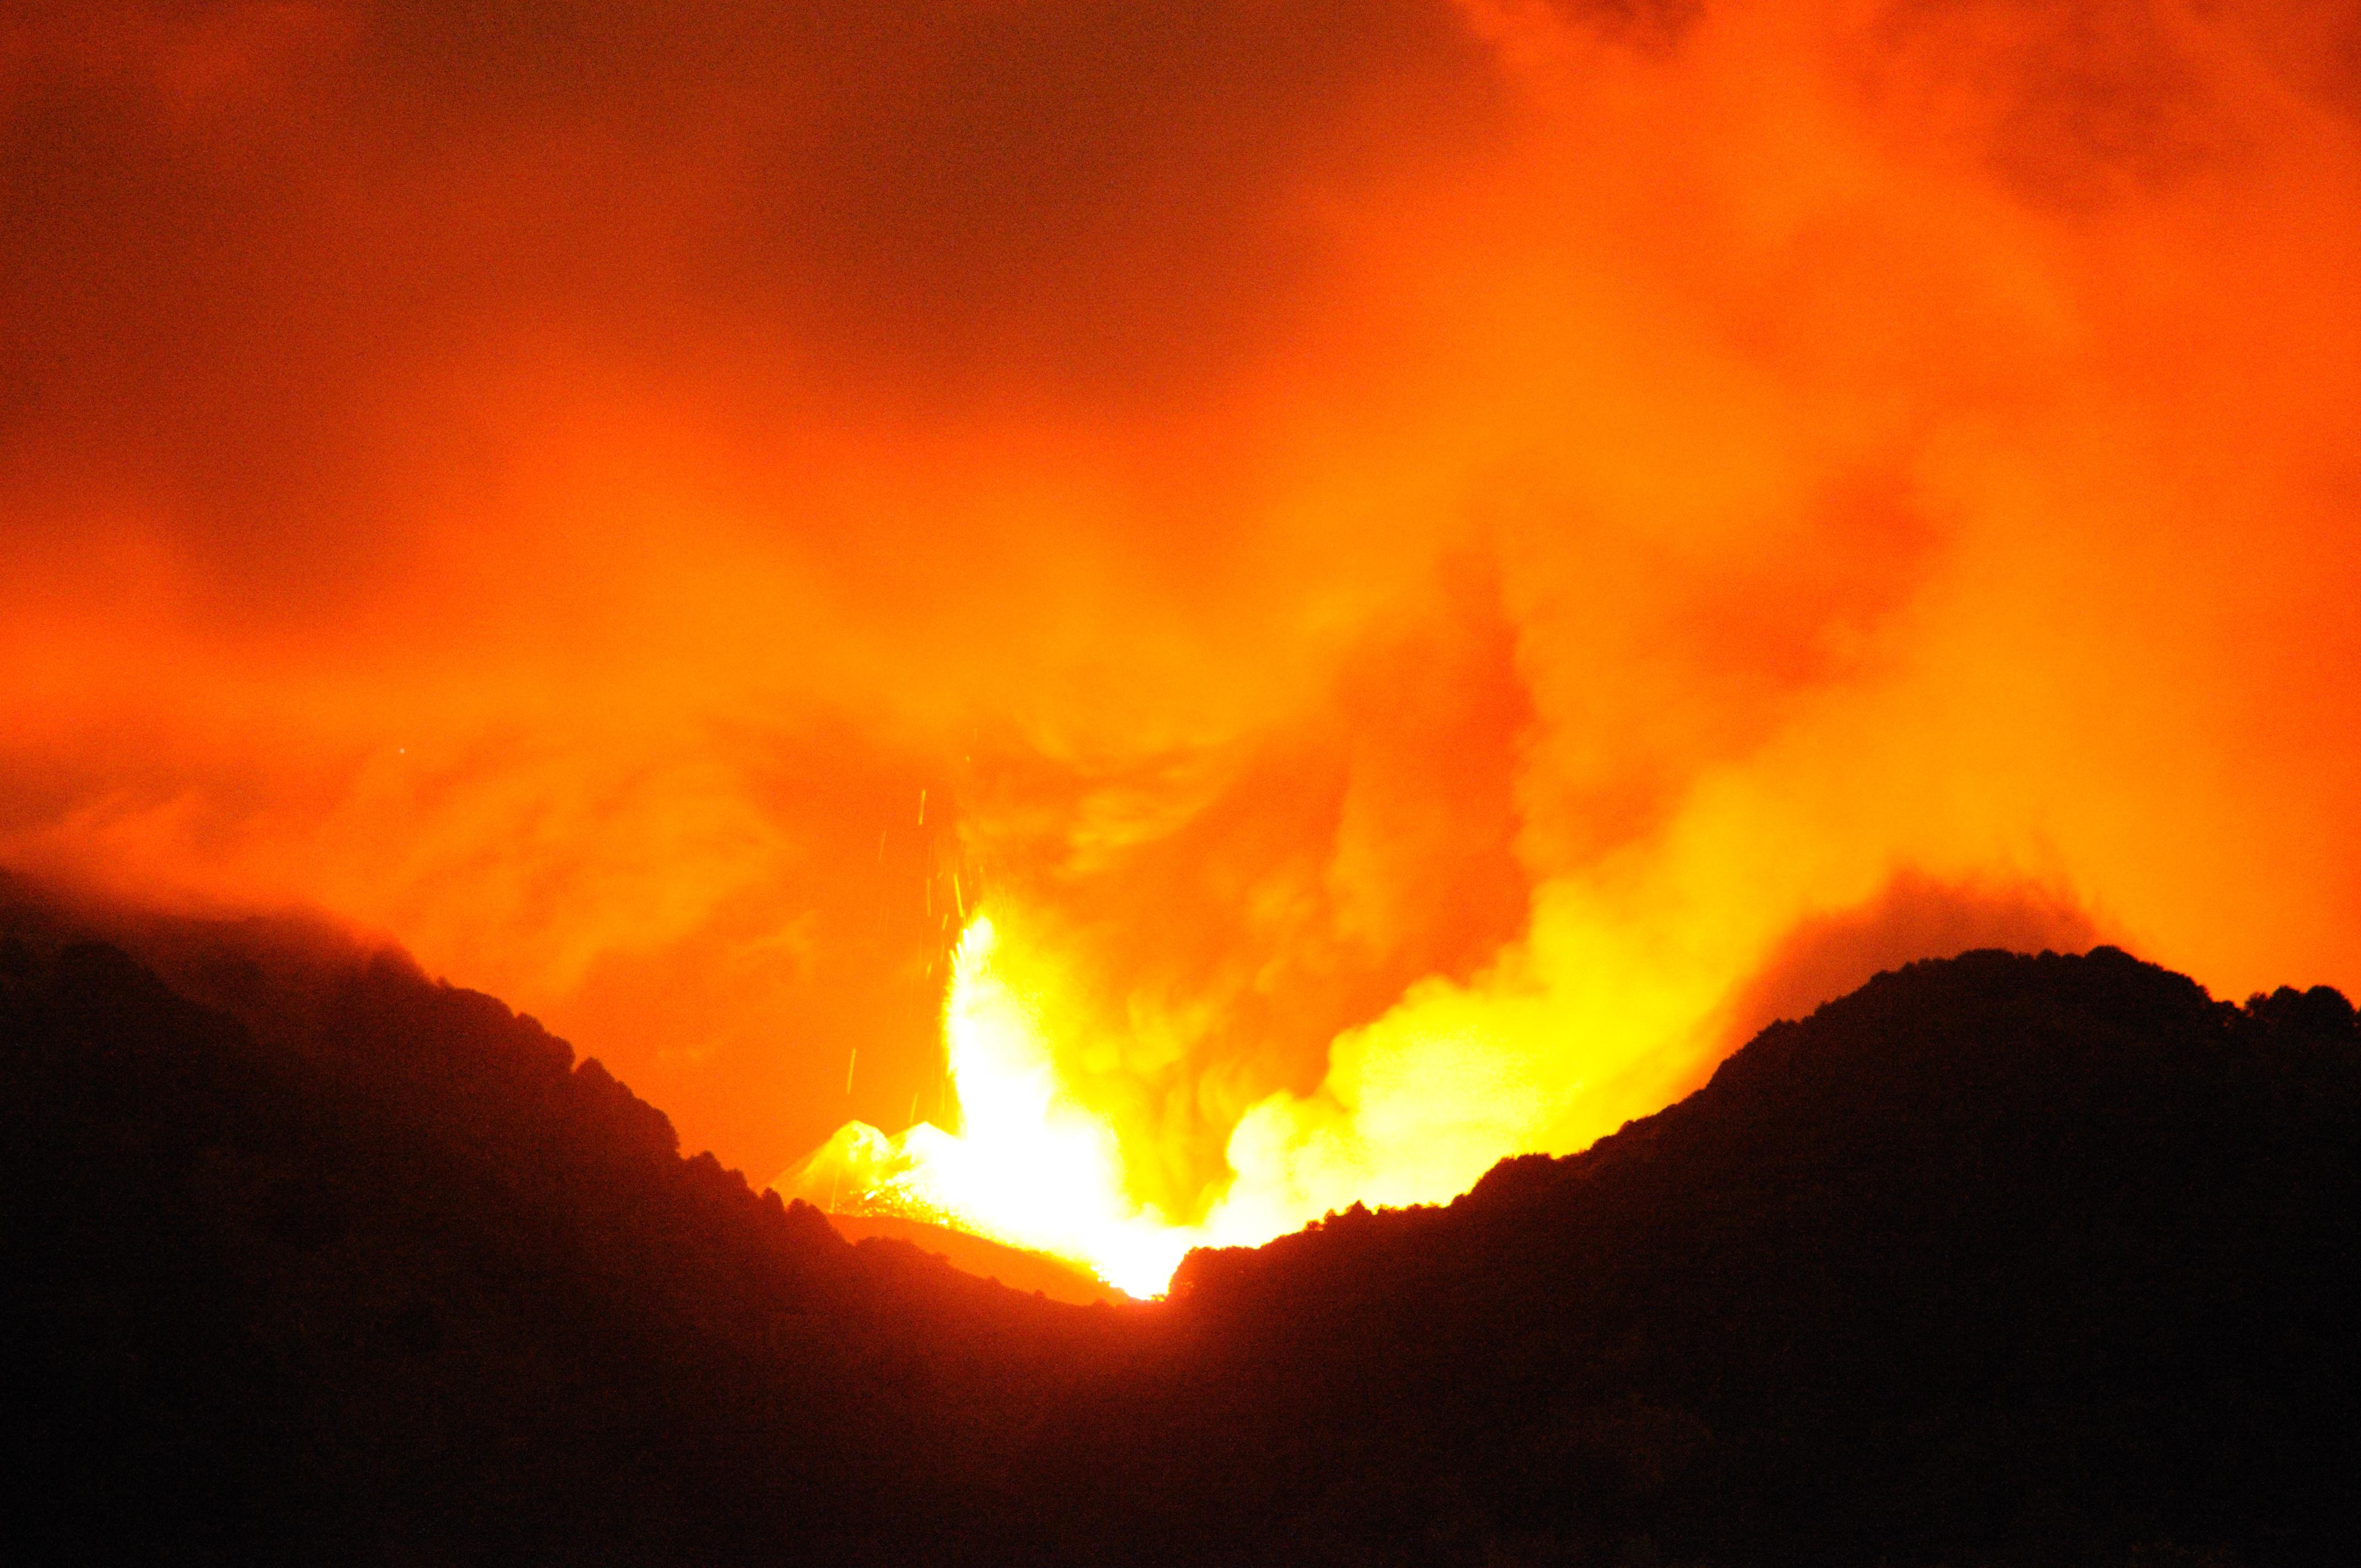 File:Etna Volcano Paroxysmal Eruption July 30 2011 - Creative ...